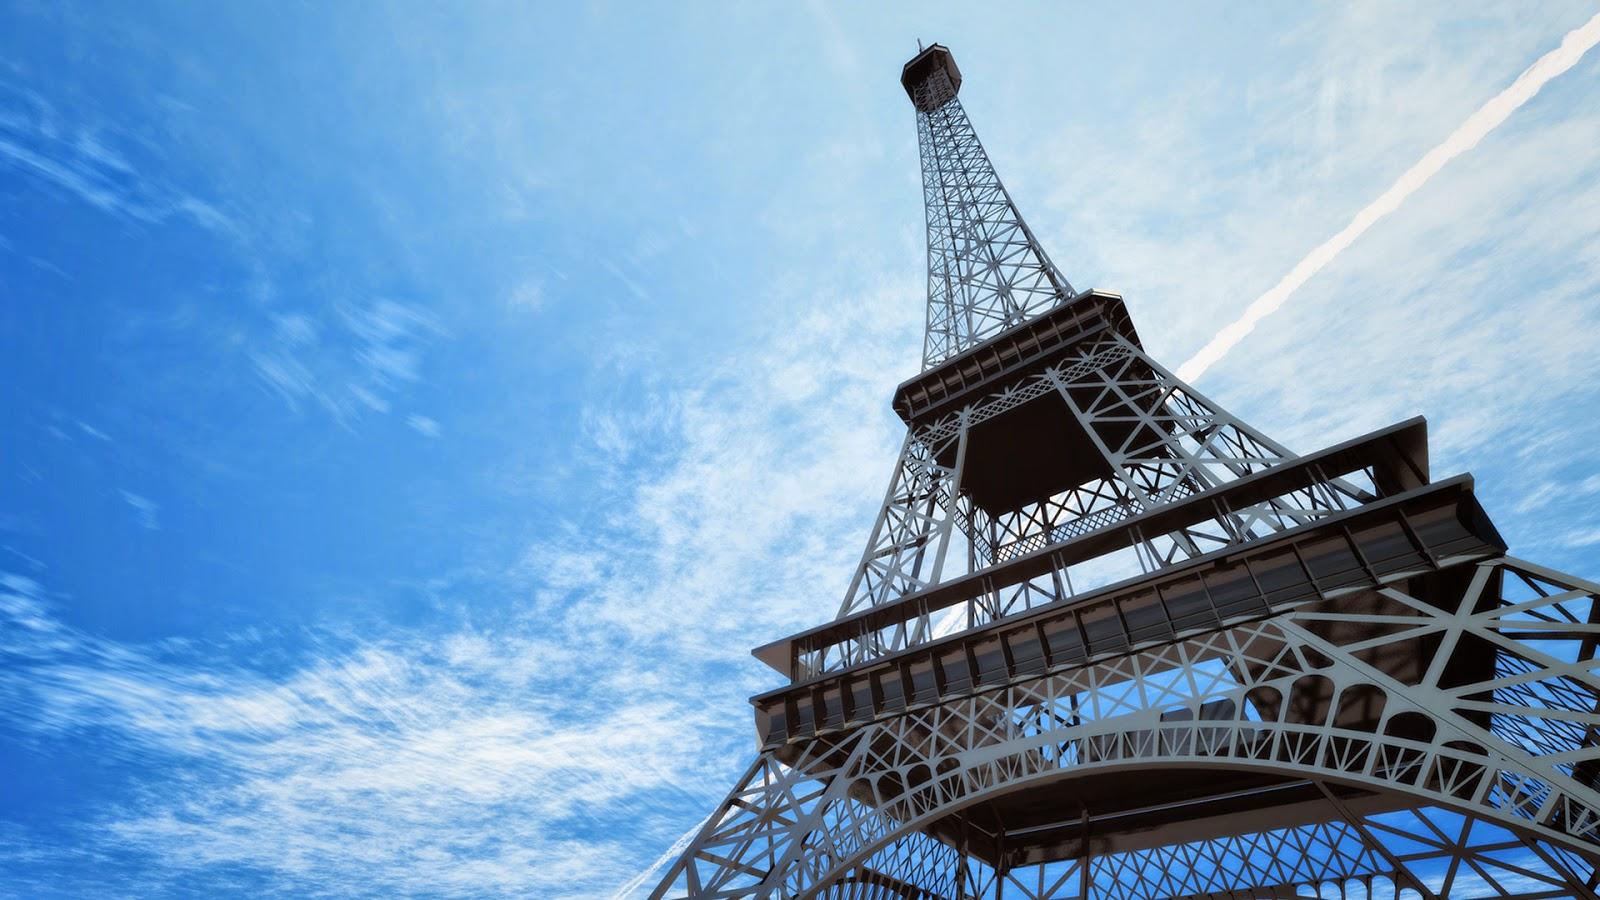 Eiffel Tower Latest Hd Wallpaprs Paris Eiffel Tower Wallpapers